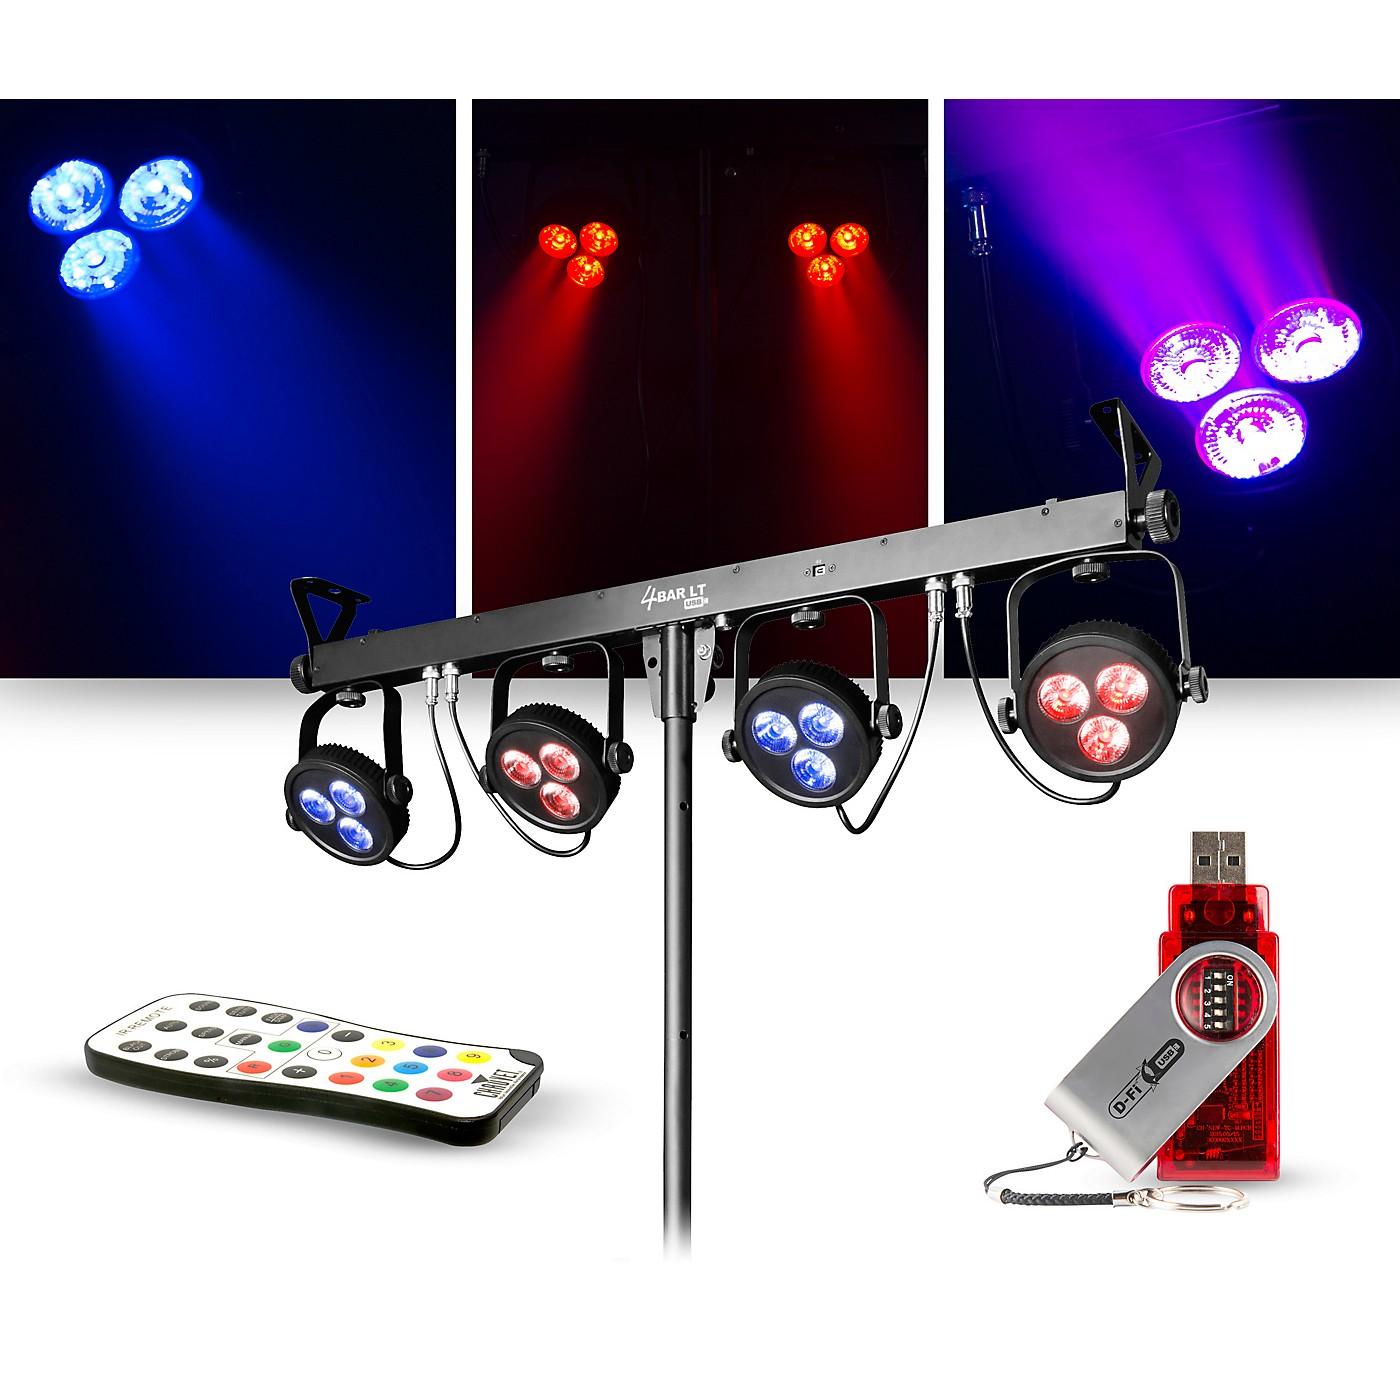 CHAUVET DJ Lighting Package with 4BAR LT USB RGB LED Effect Light, D-Fi USB Wireless Transmitter and IRC-6 Remote thumbnail